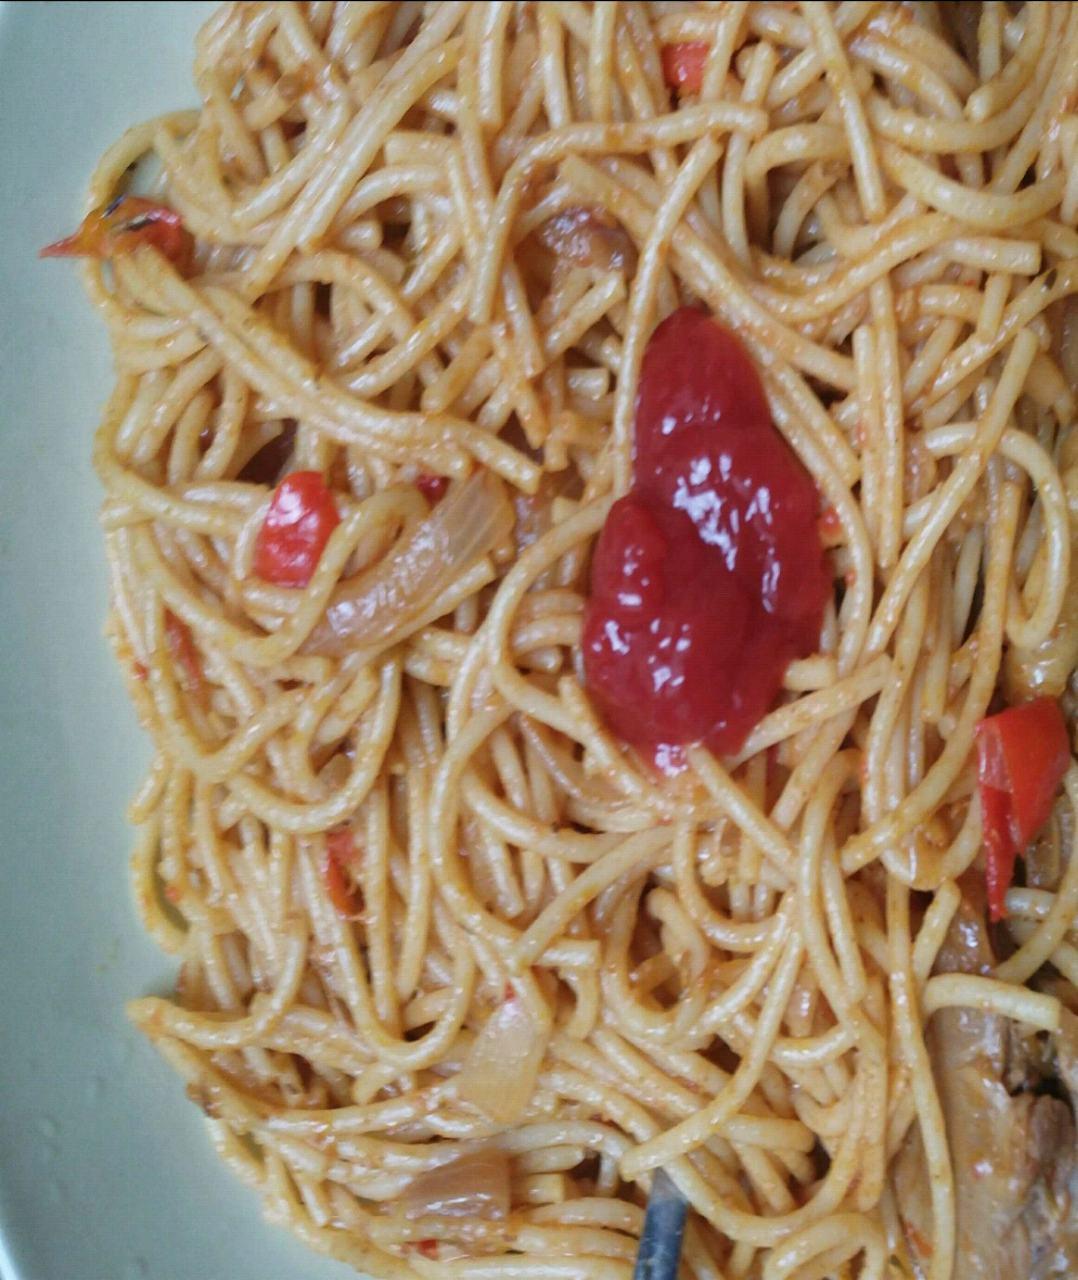 Mixed Pasta With Sauce